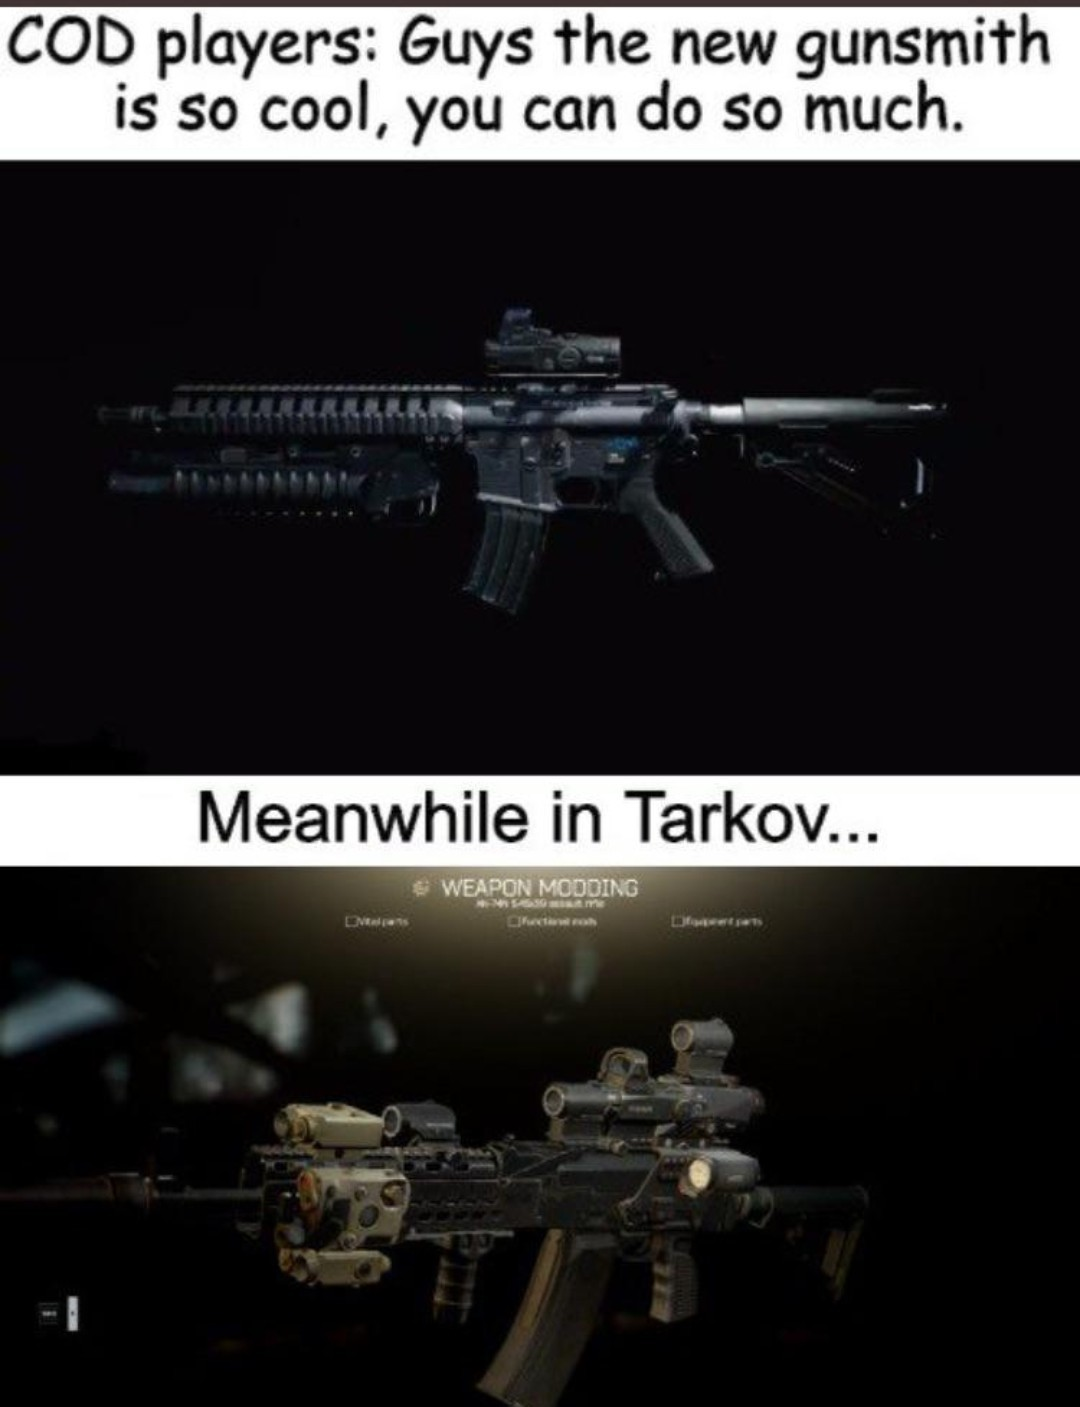 Tarkov gun modding is crazy! - meme